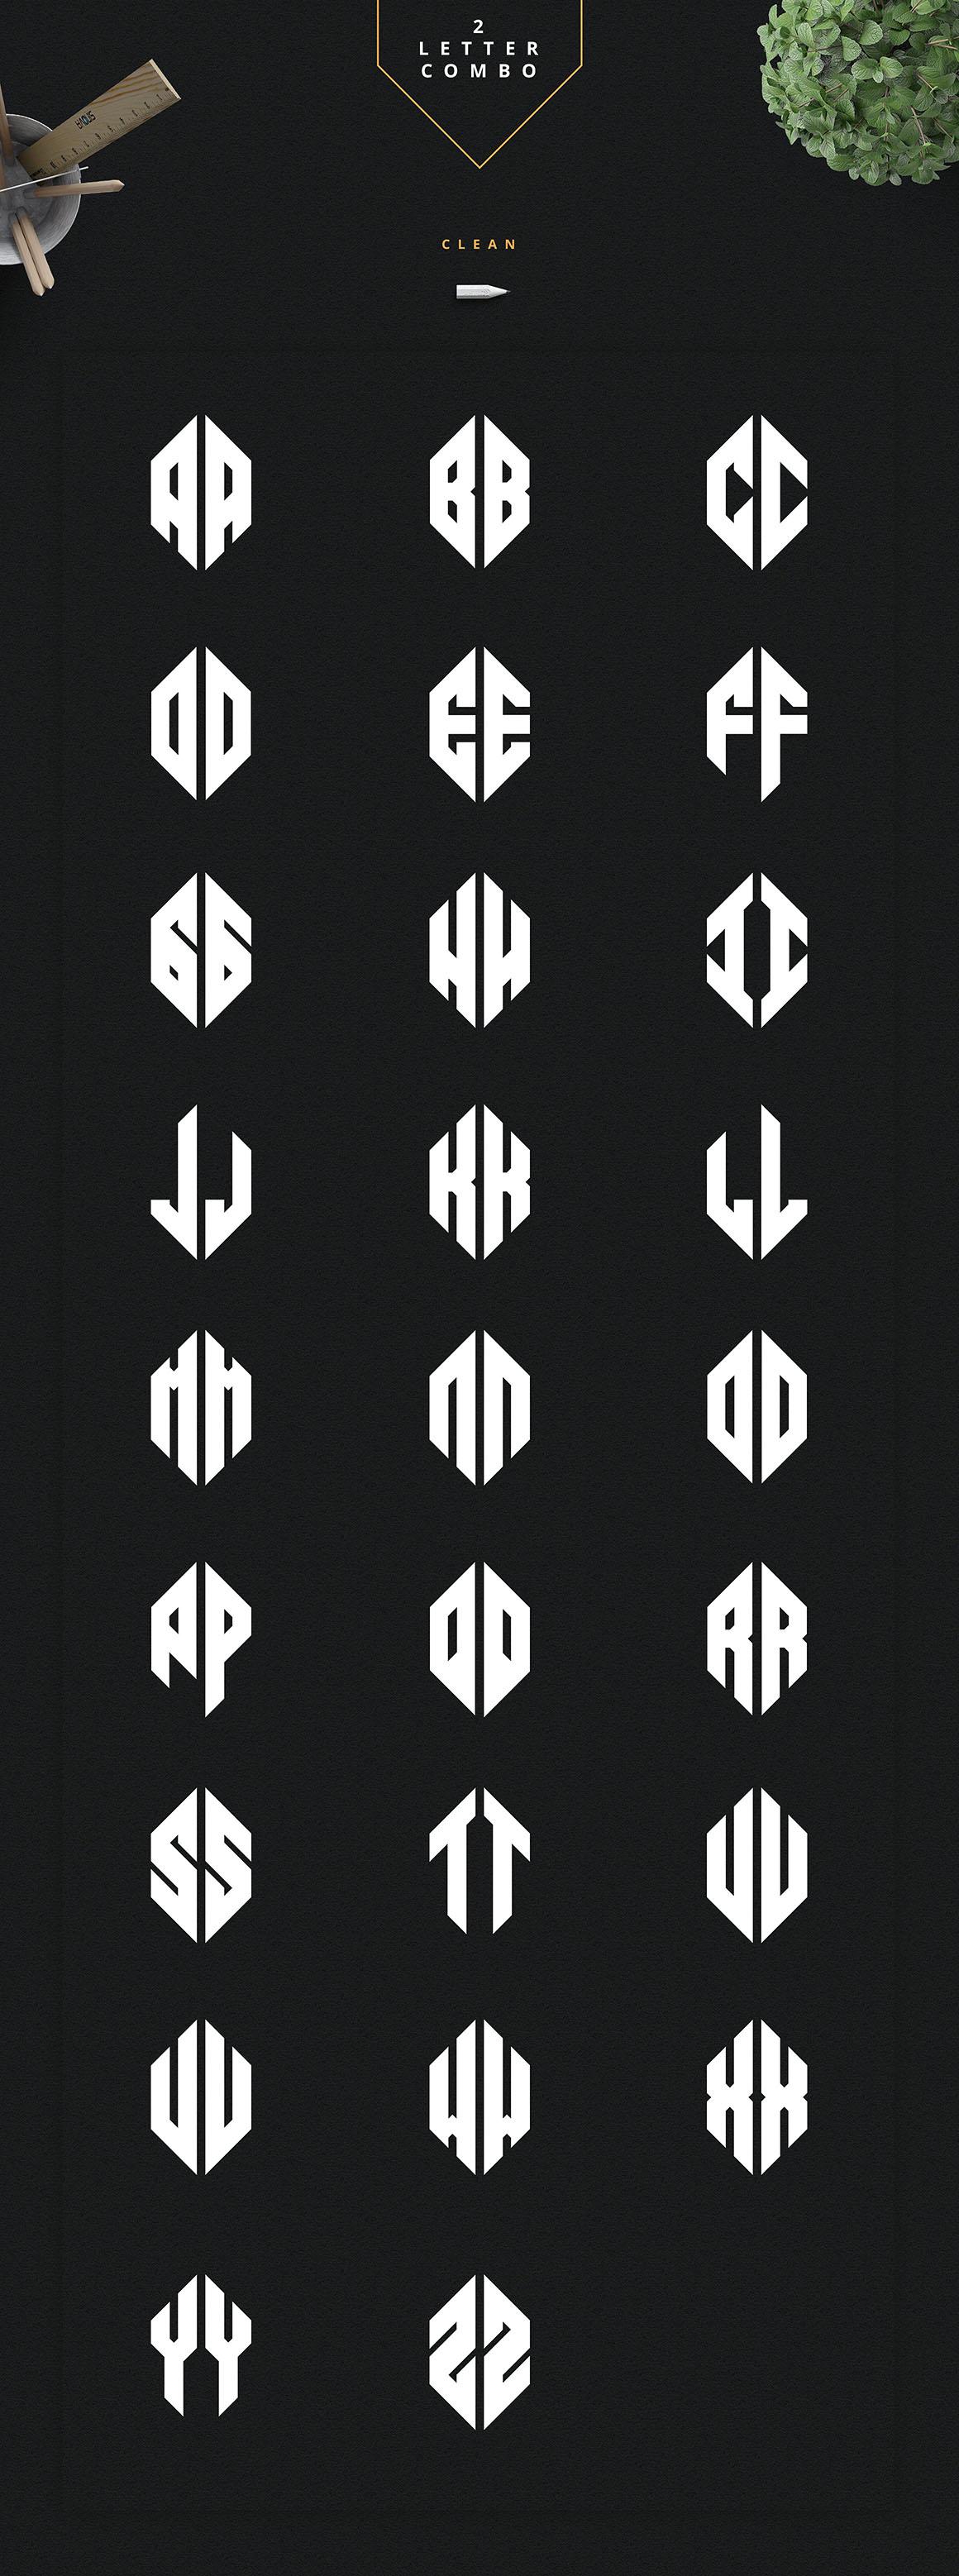 6in1-Ultimate-Monogram-creator-05.jpg